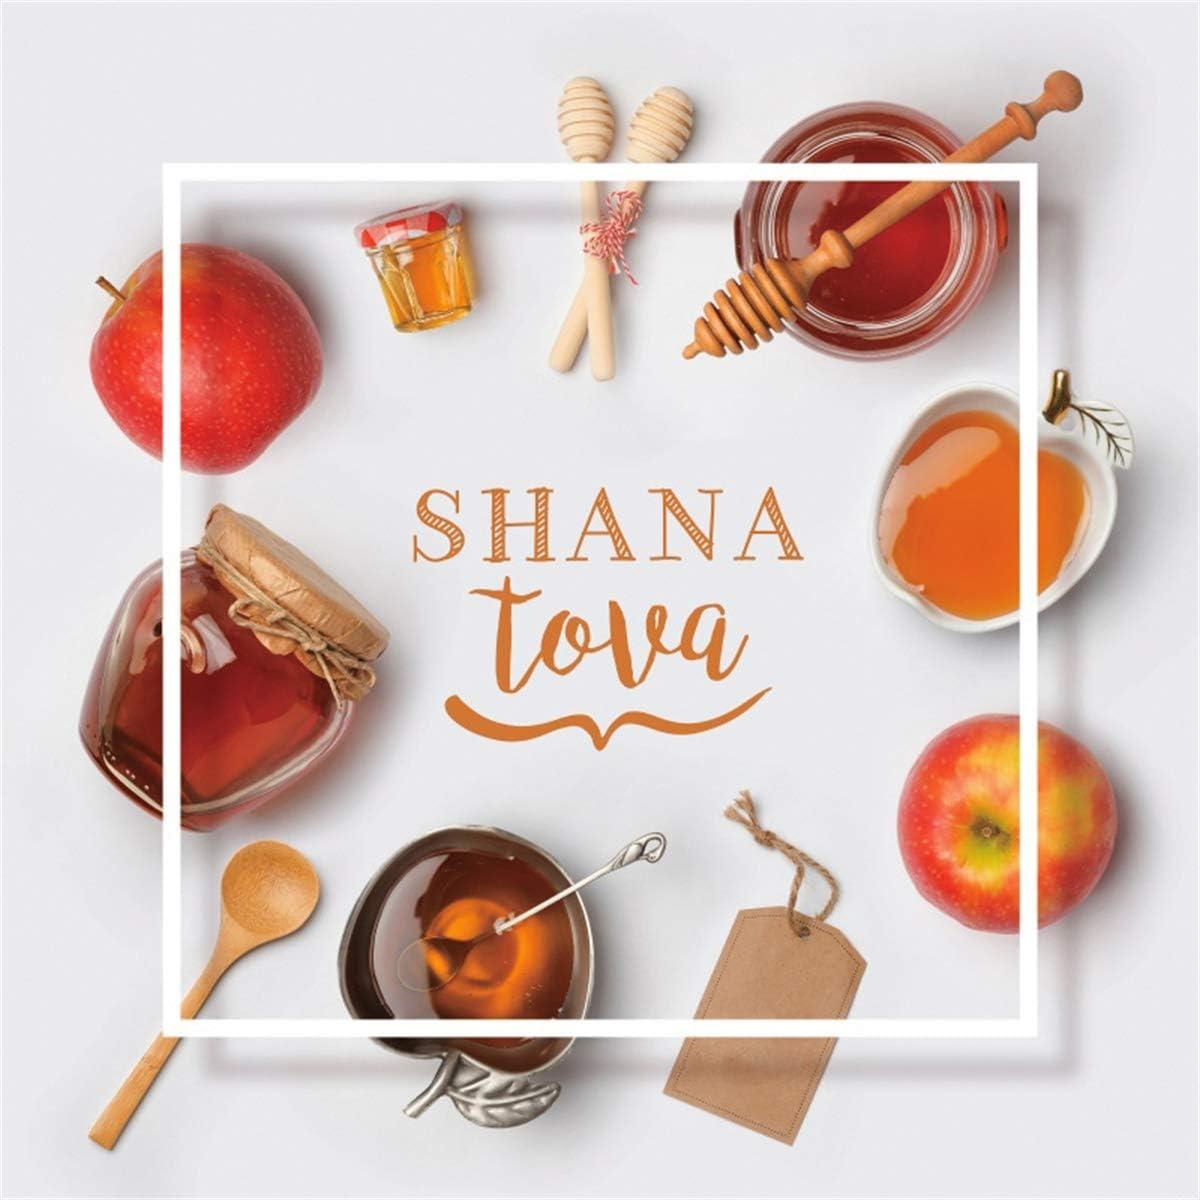 YEELE 10x10ft Shana Tova Backdrop Jewish Holiday Rosh Hashana Honey and Apple Photography Background Jewish New Year Holiday Photoshoot Props Artistic Portrait Wallpaper